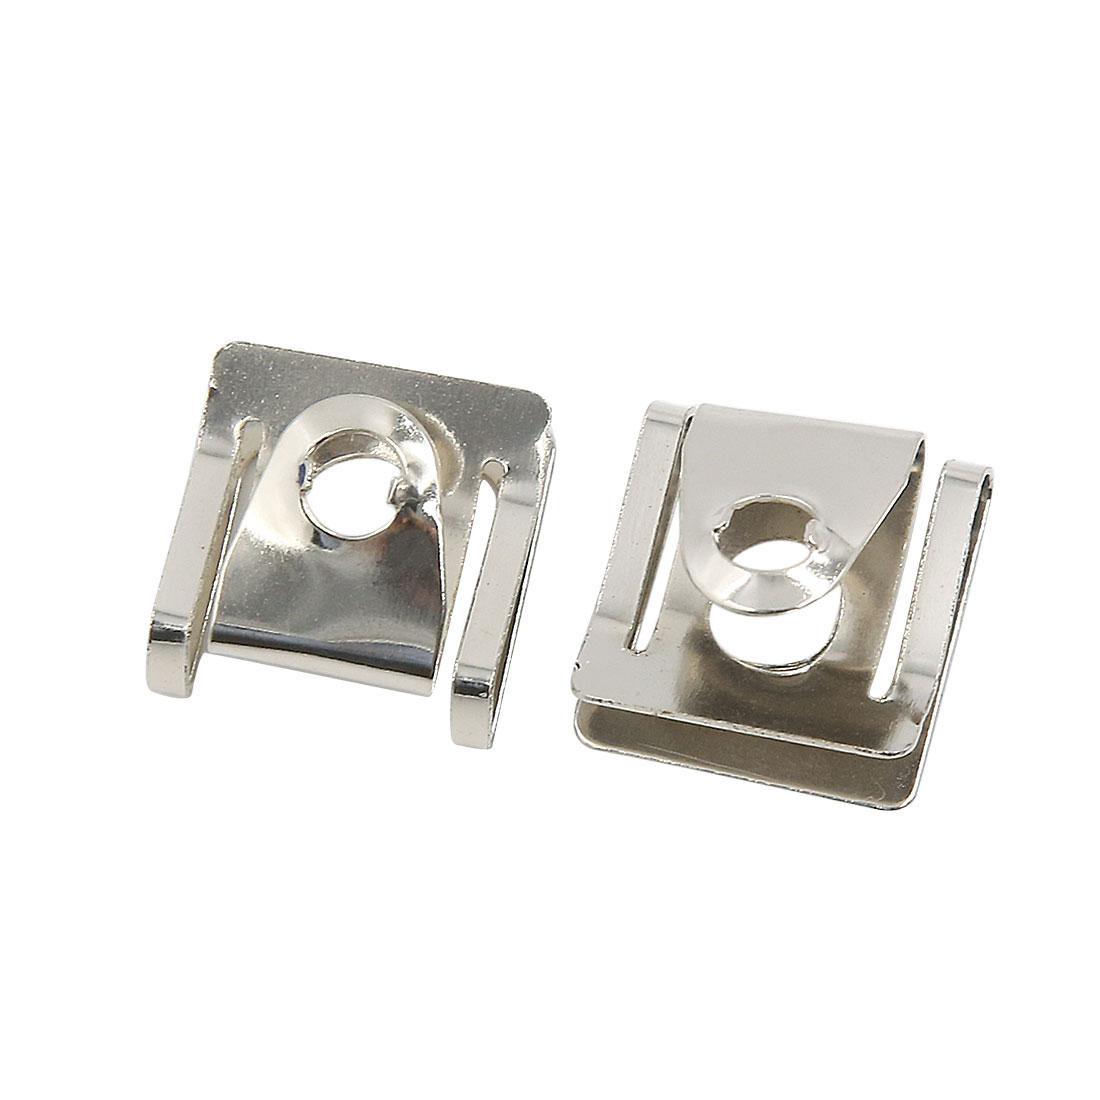 50 Pcs Silver Tone U-Type Rivets Door Panel Screw Fastener Clips 9mm Hole